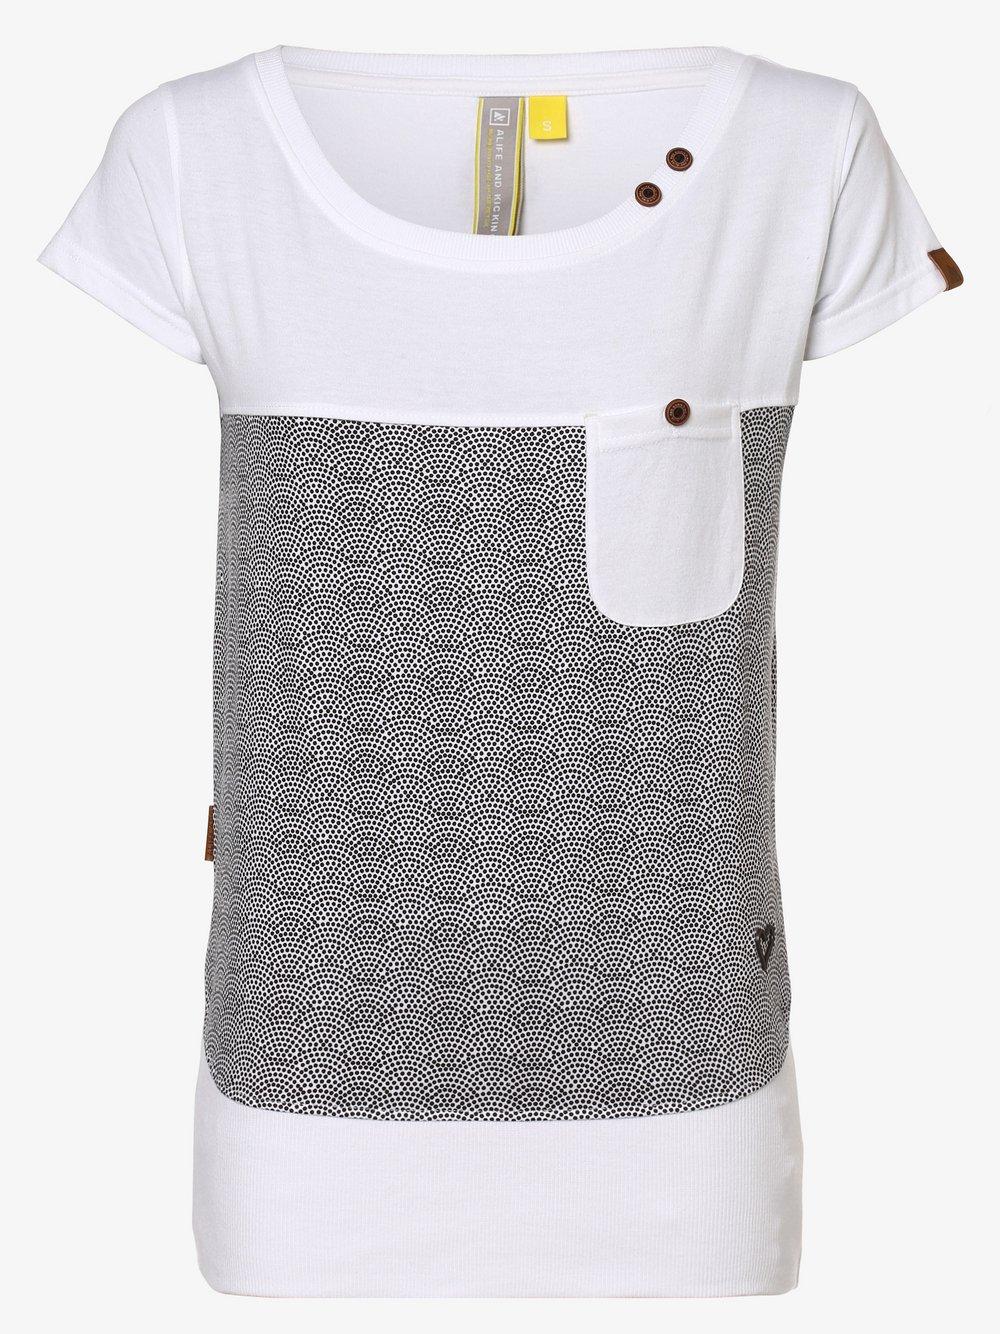 alife and kickin - T-shirt damski – Cora, biały